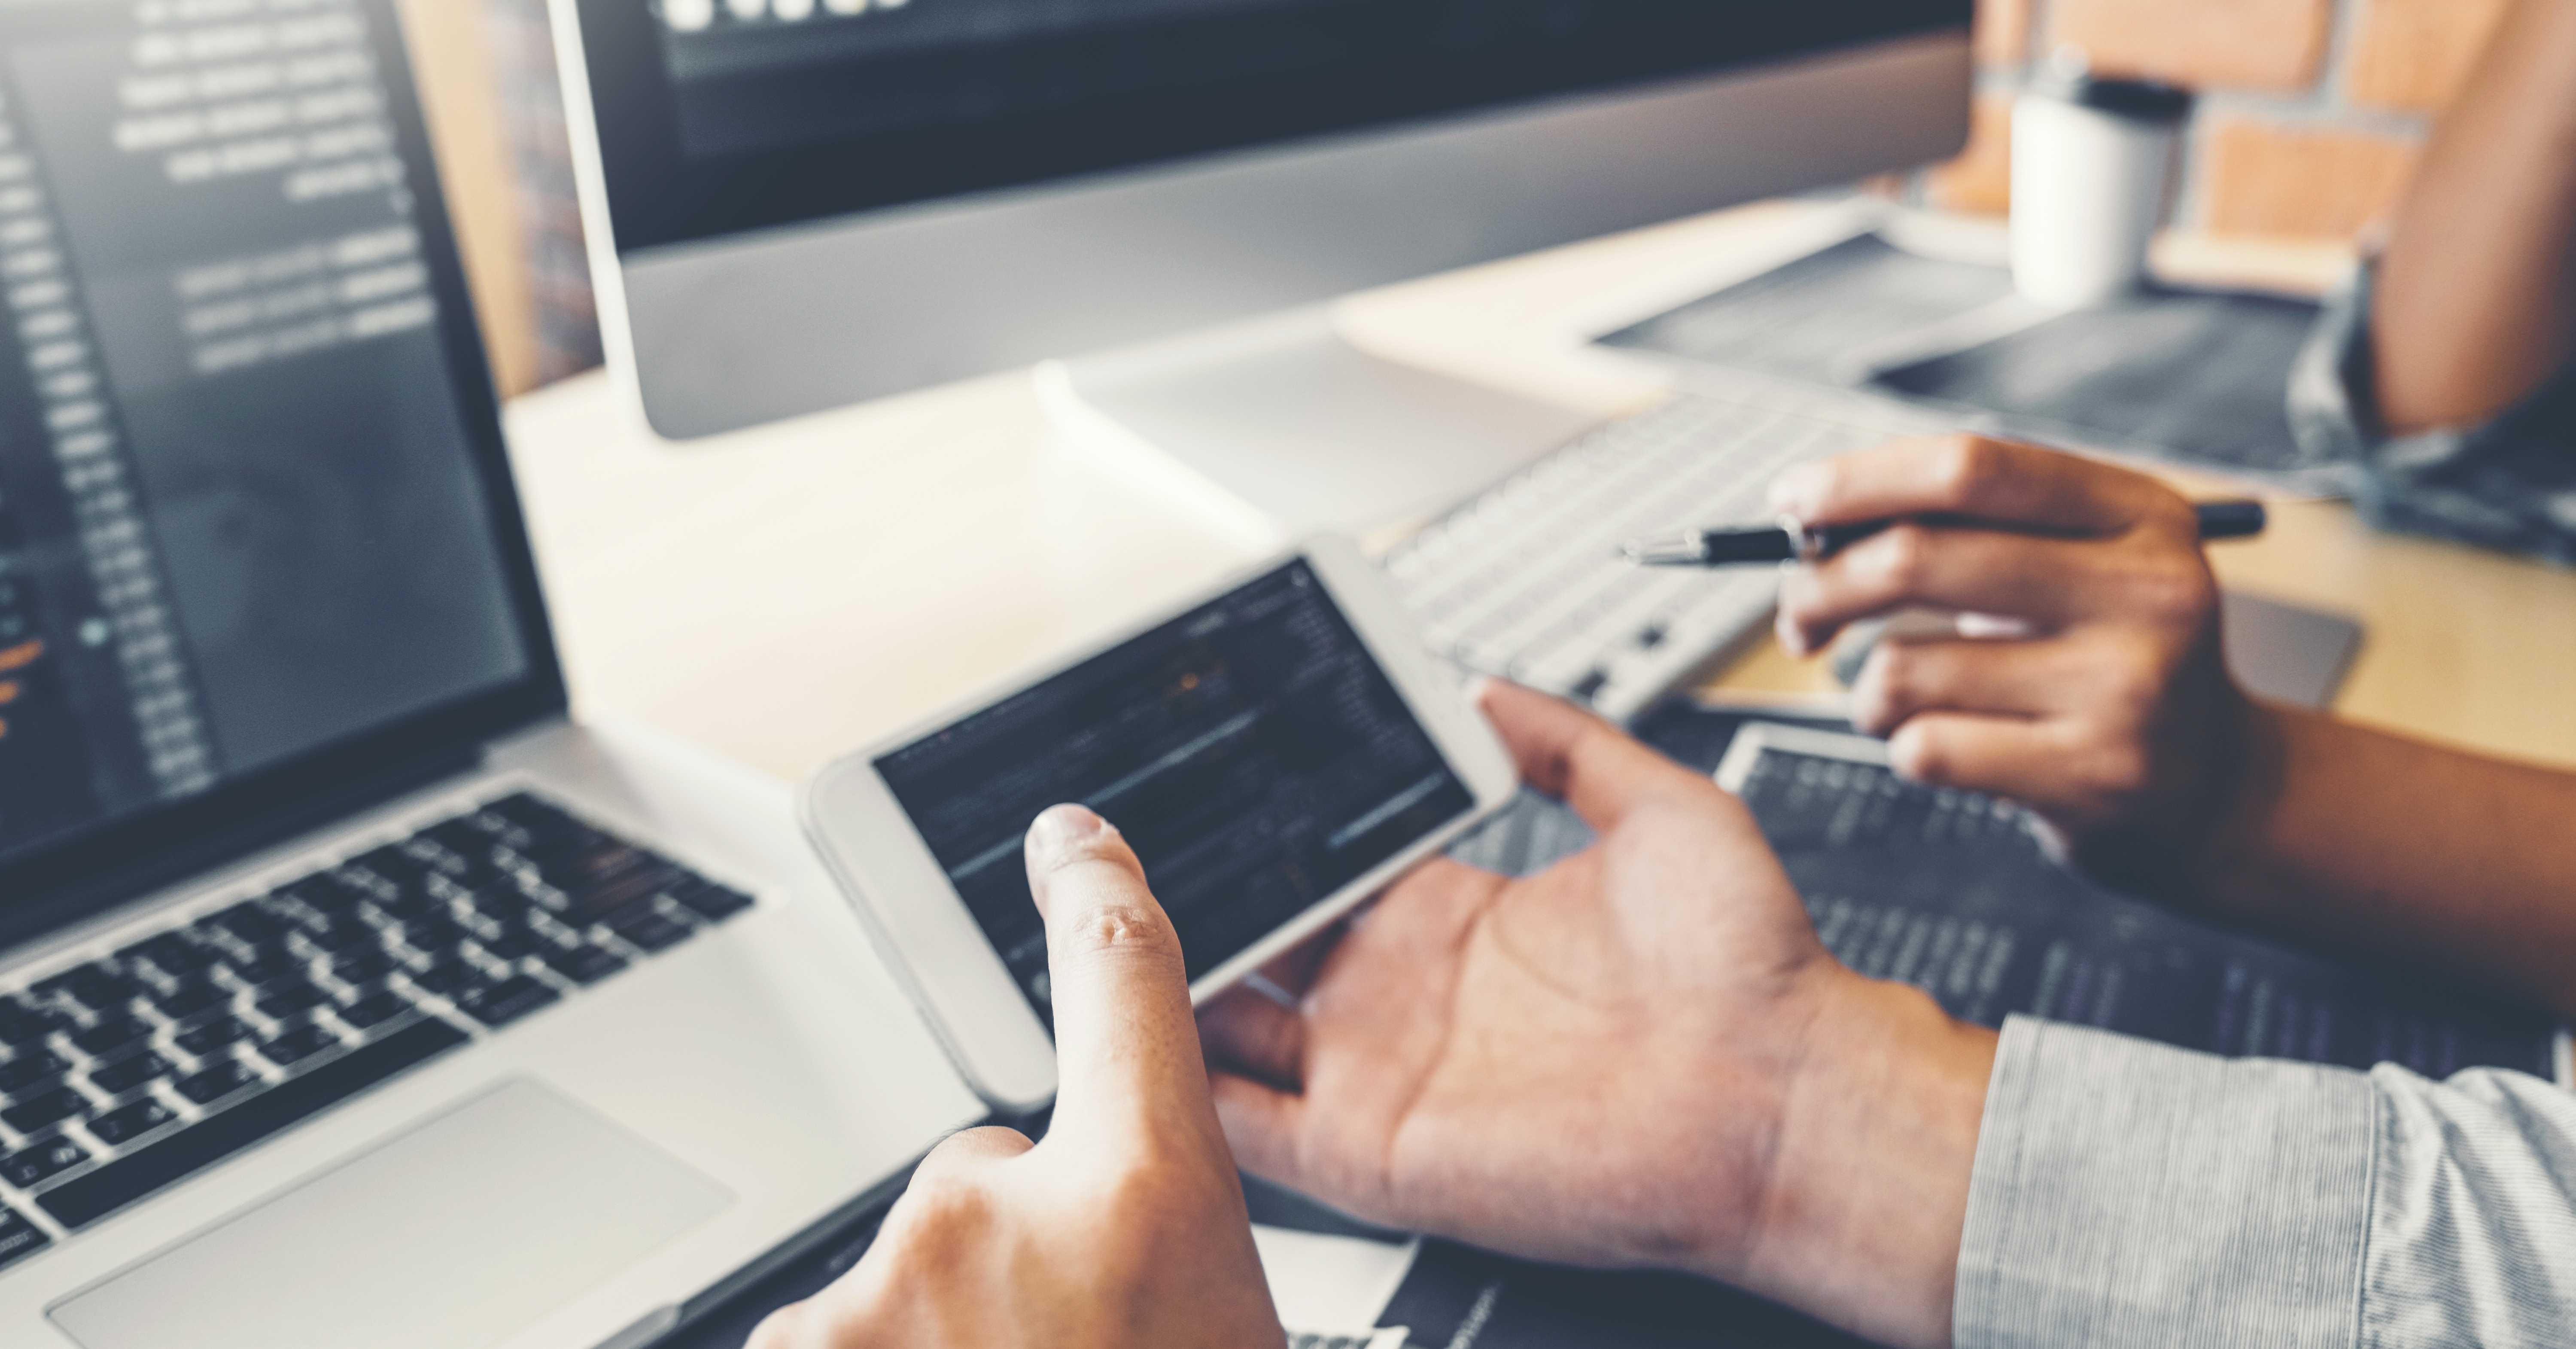 Enterprise Application Delivery - Custom Build vs Off-The-Shelf